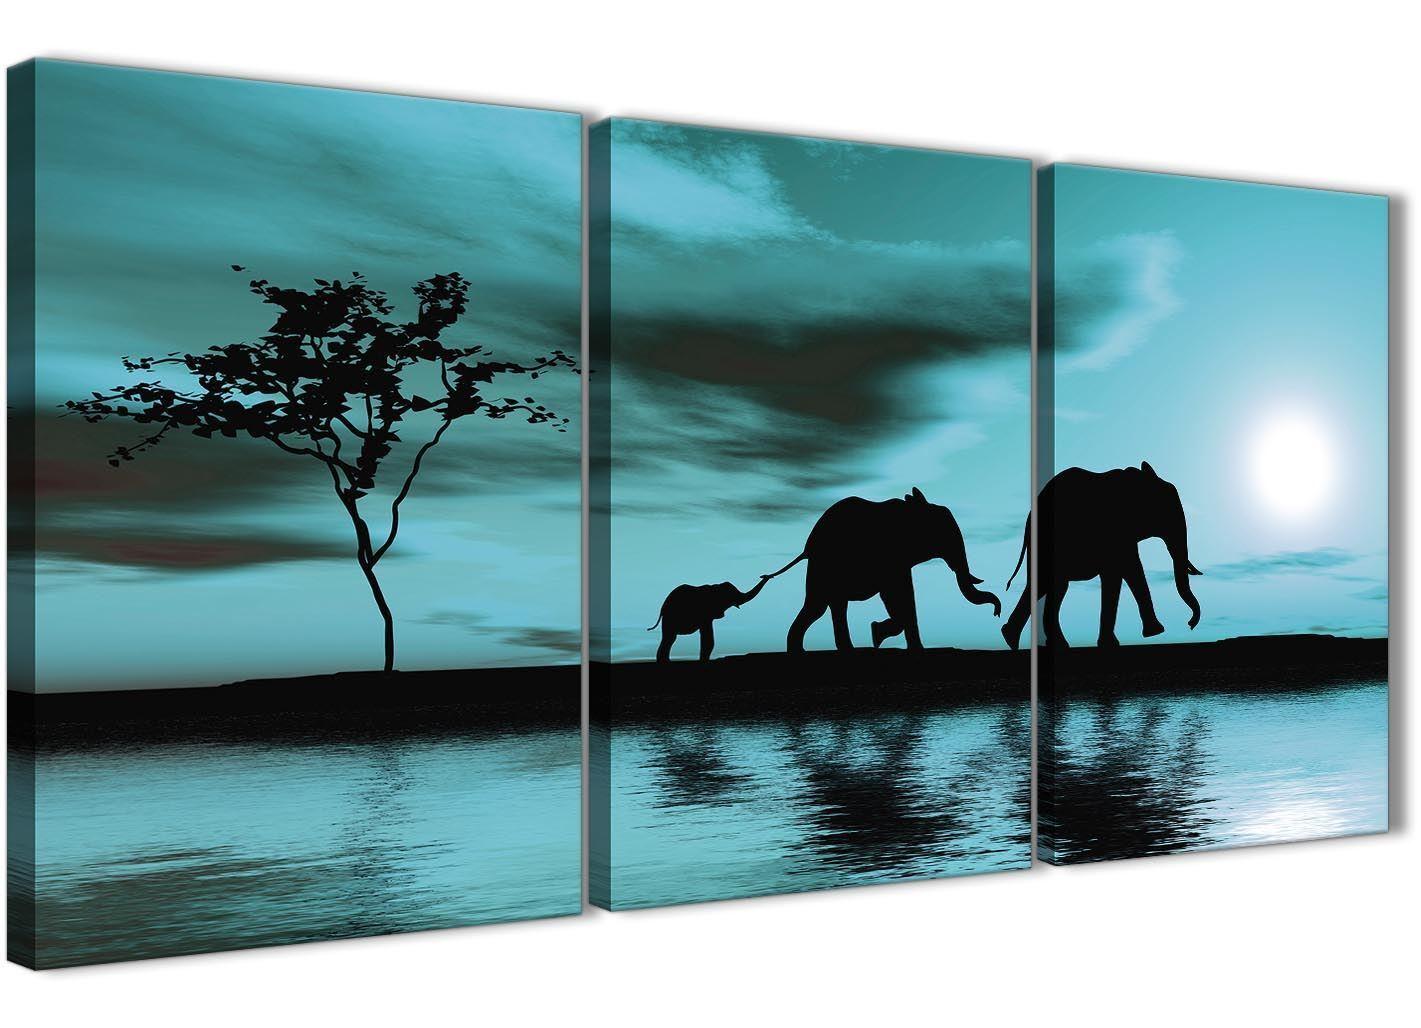 verde Acqua DELL'AFRICA TRAMONTO ELEFANTI Tela Art Print-Set di 3-larghezza 125 cm - 3362